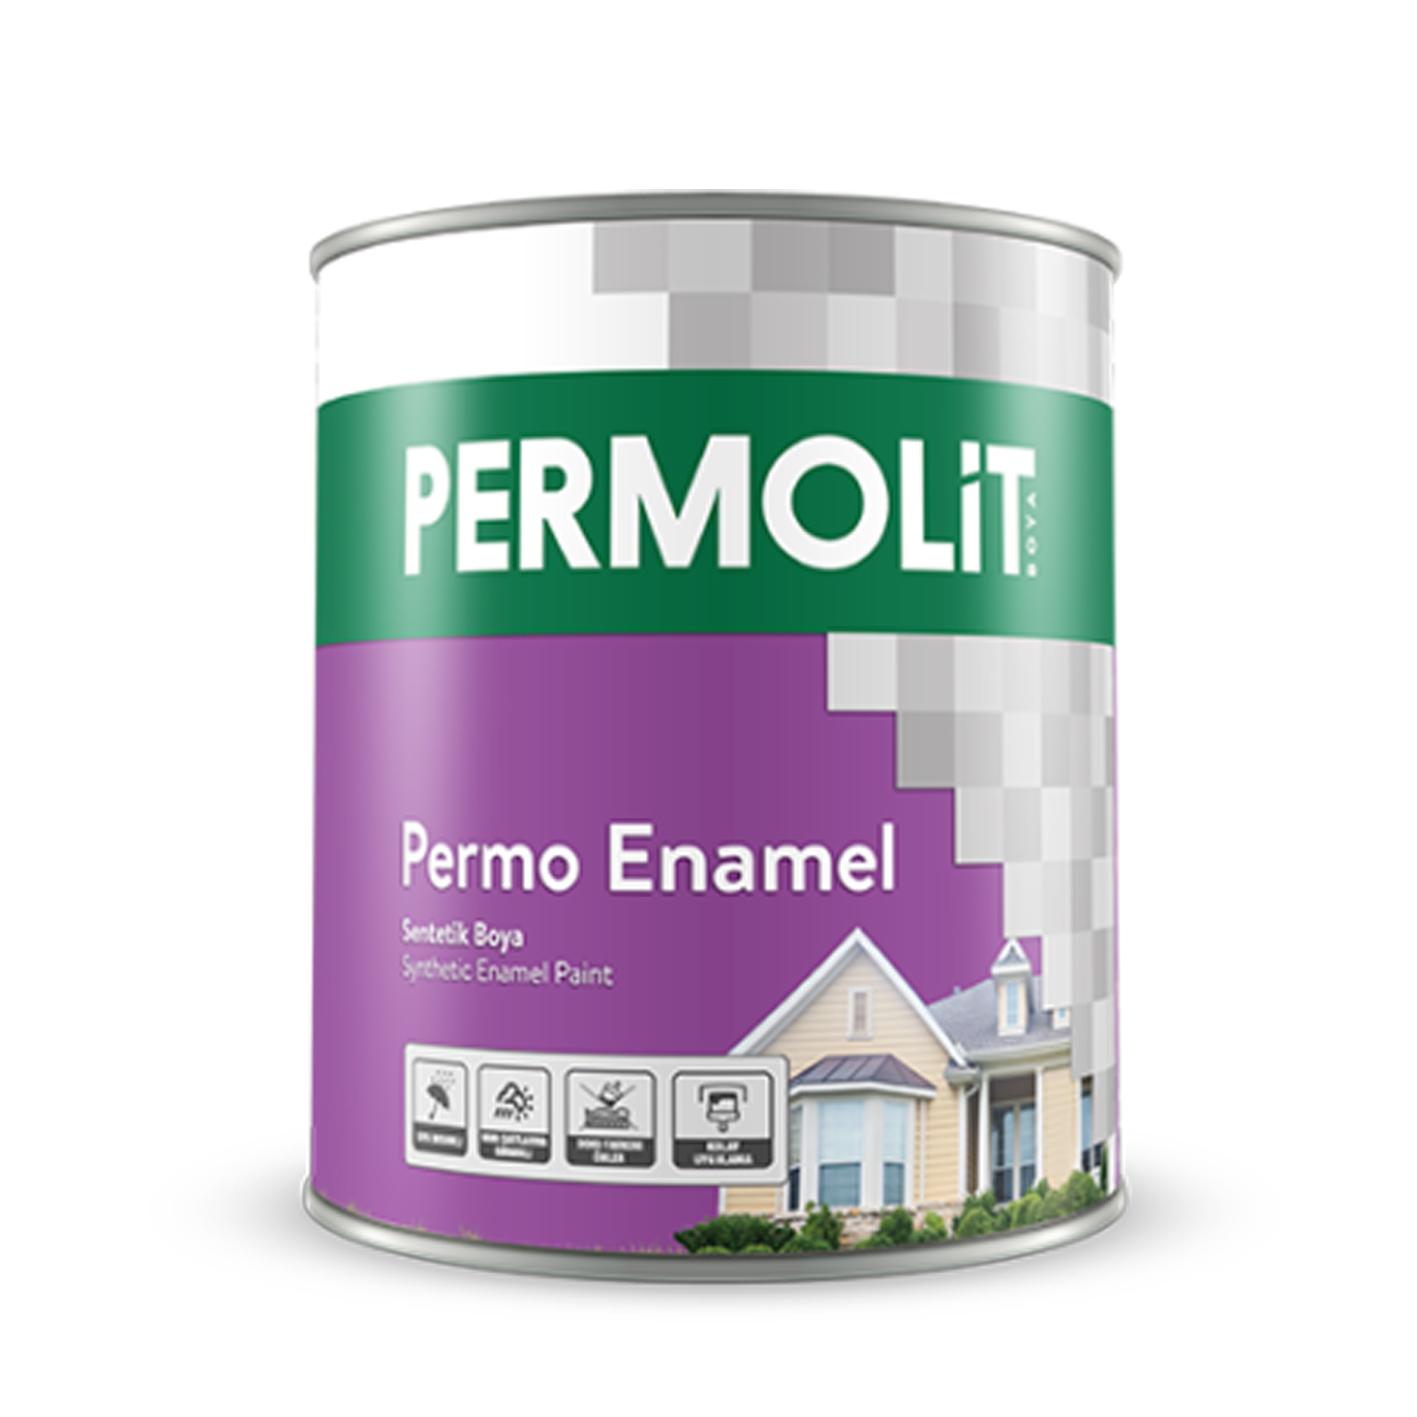 Permolit Permo Enamel Sentetik Siyah 2.5Lt